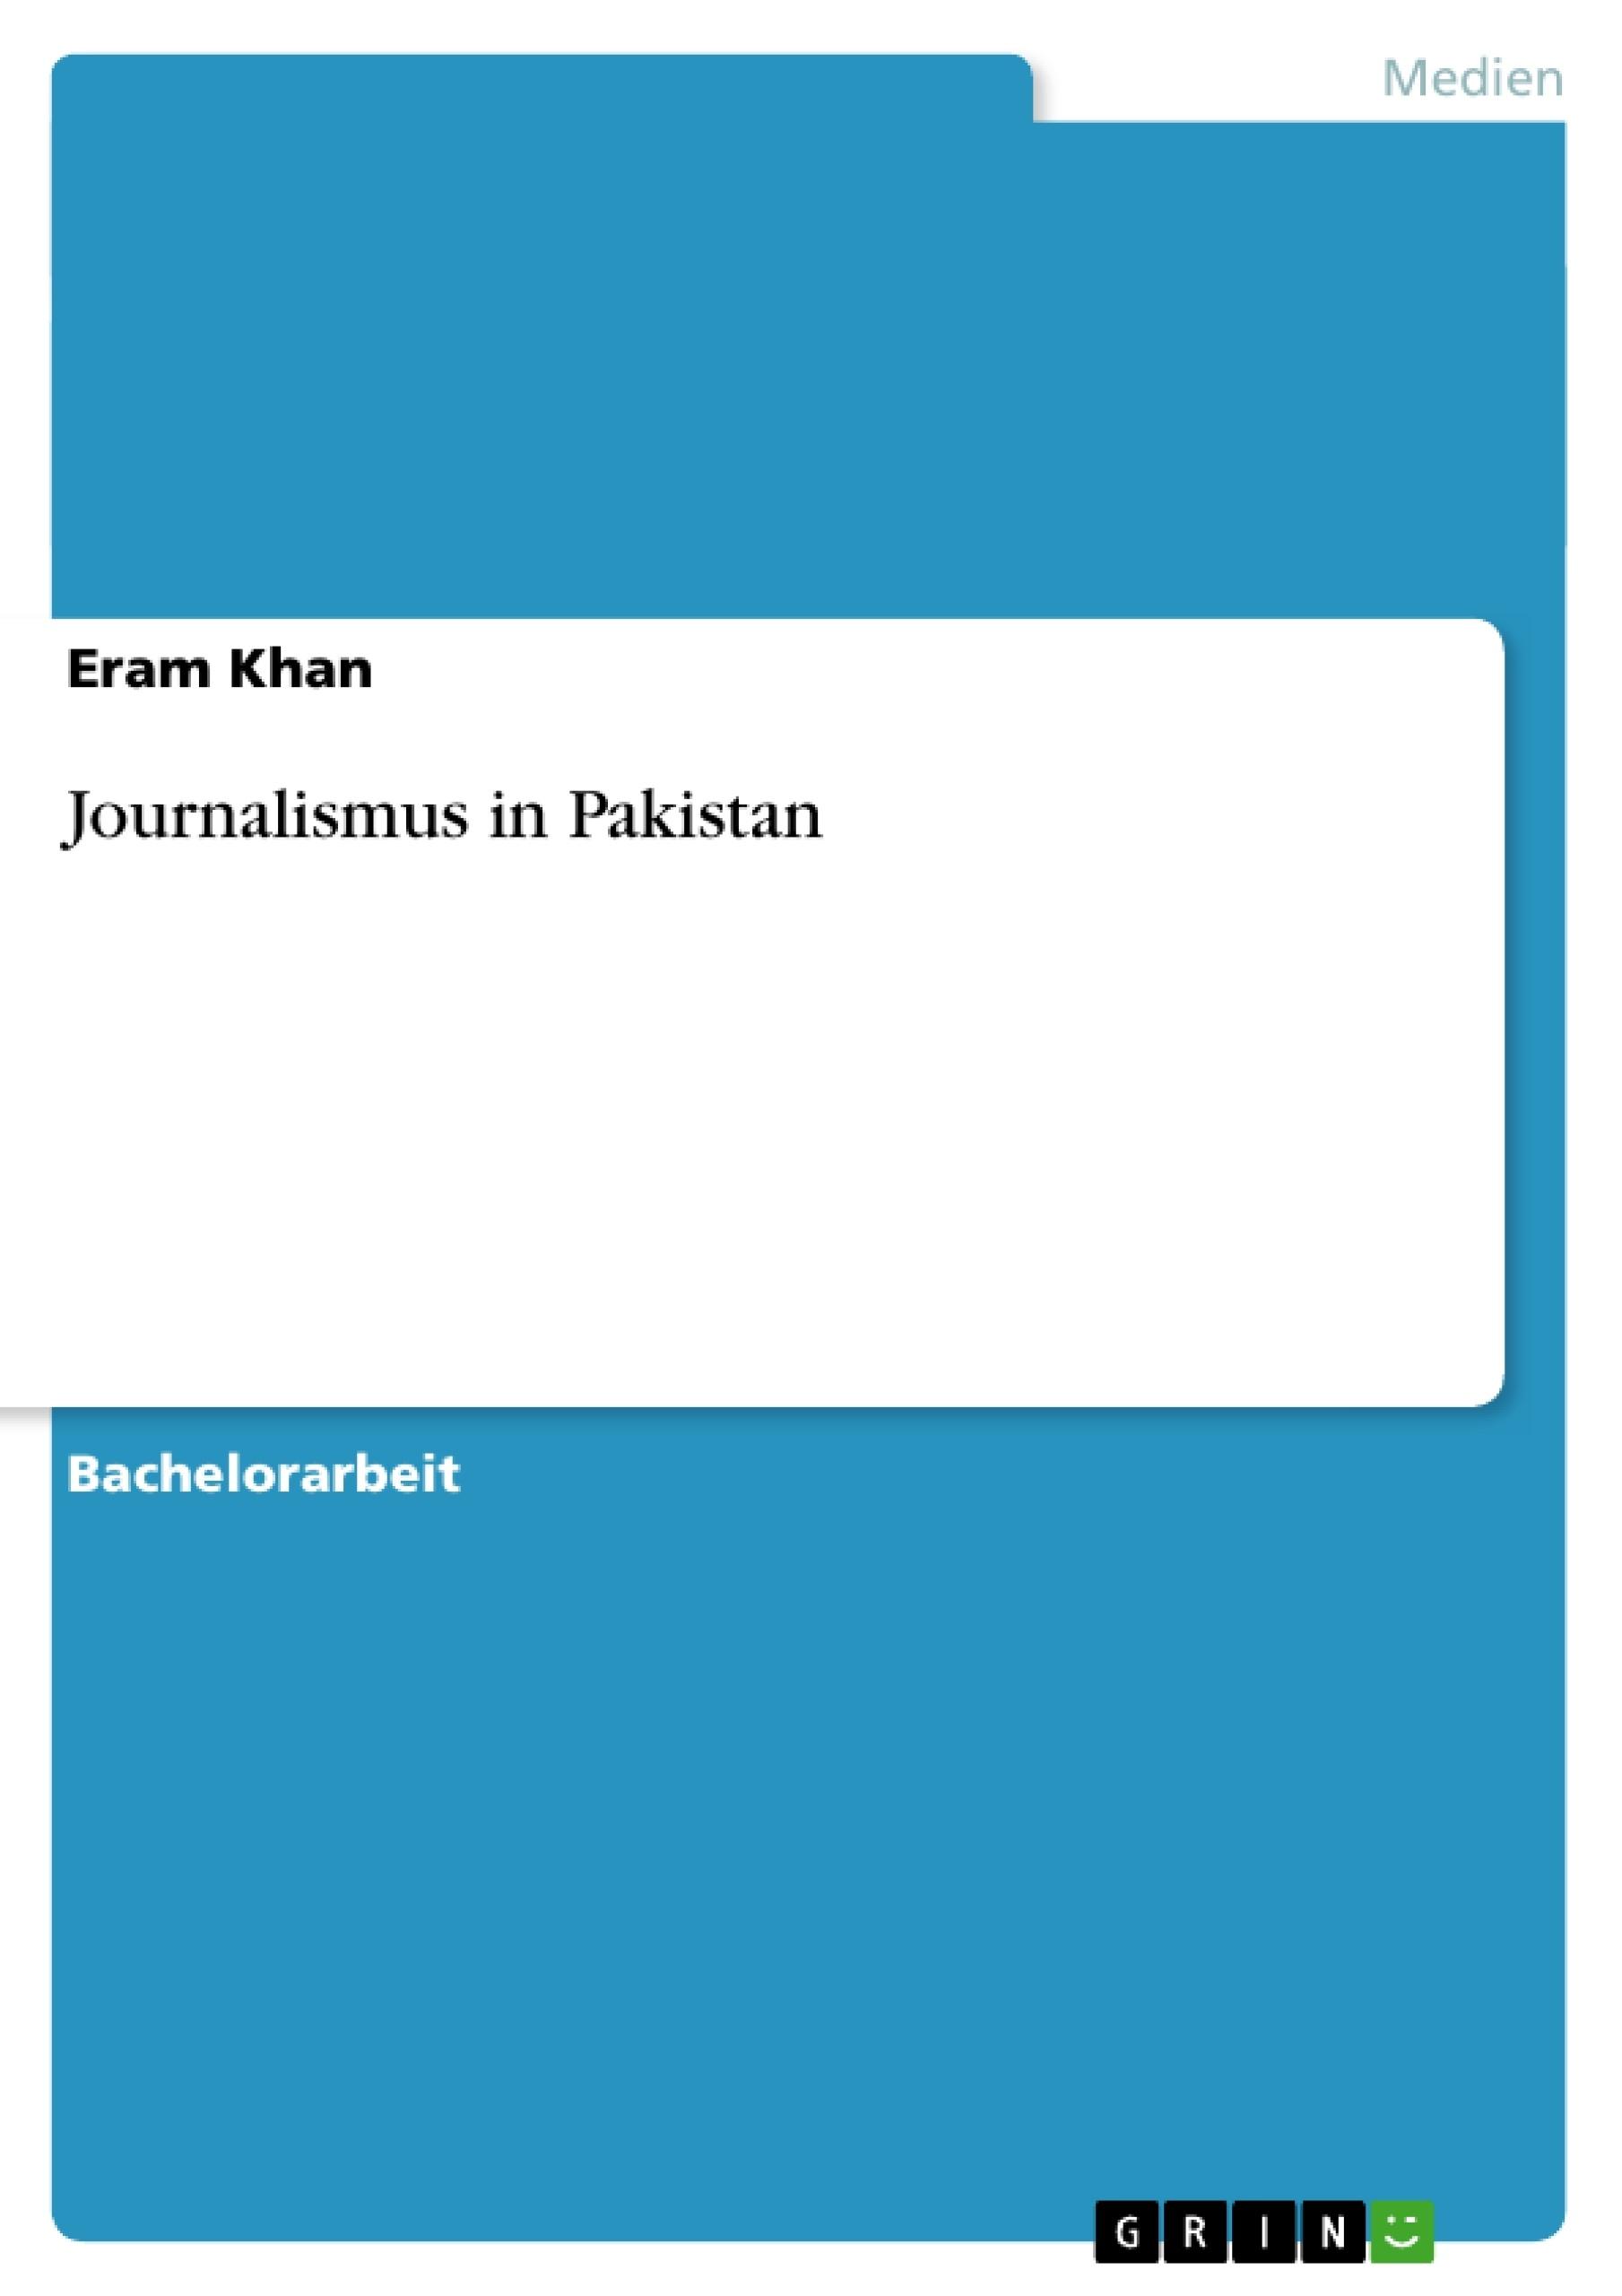 Titel: Journalismus in Pakistan